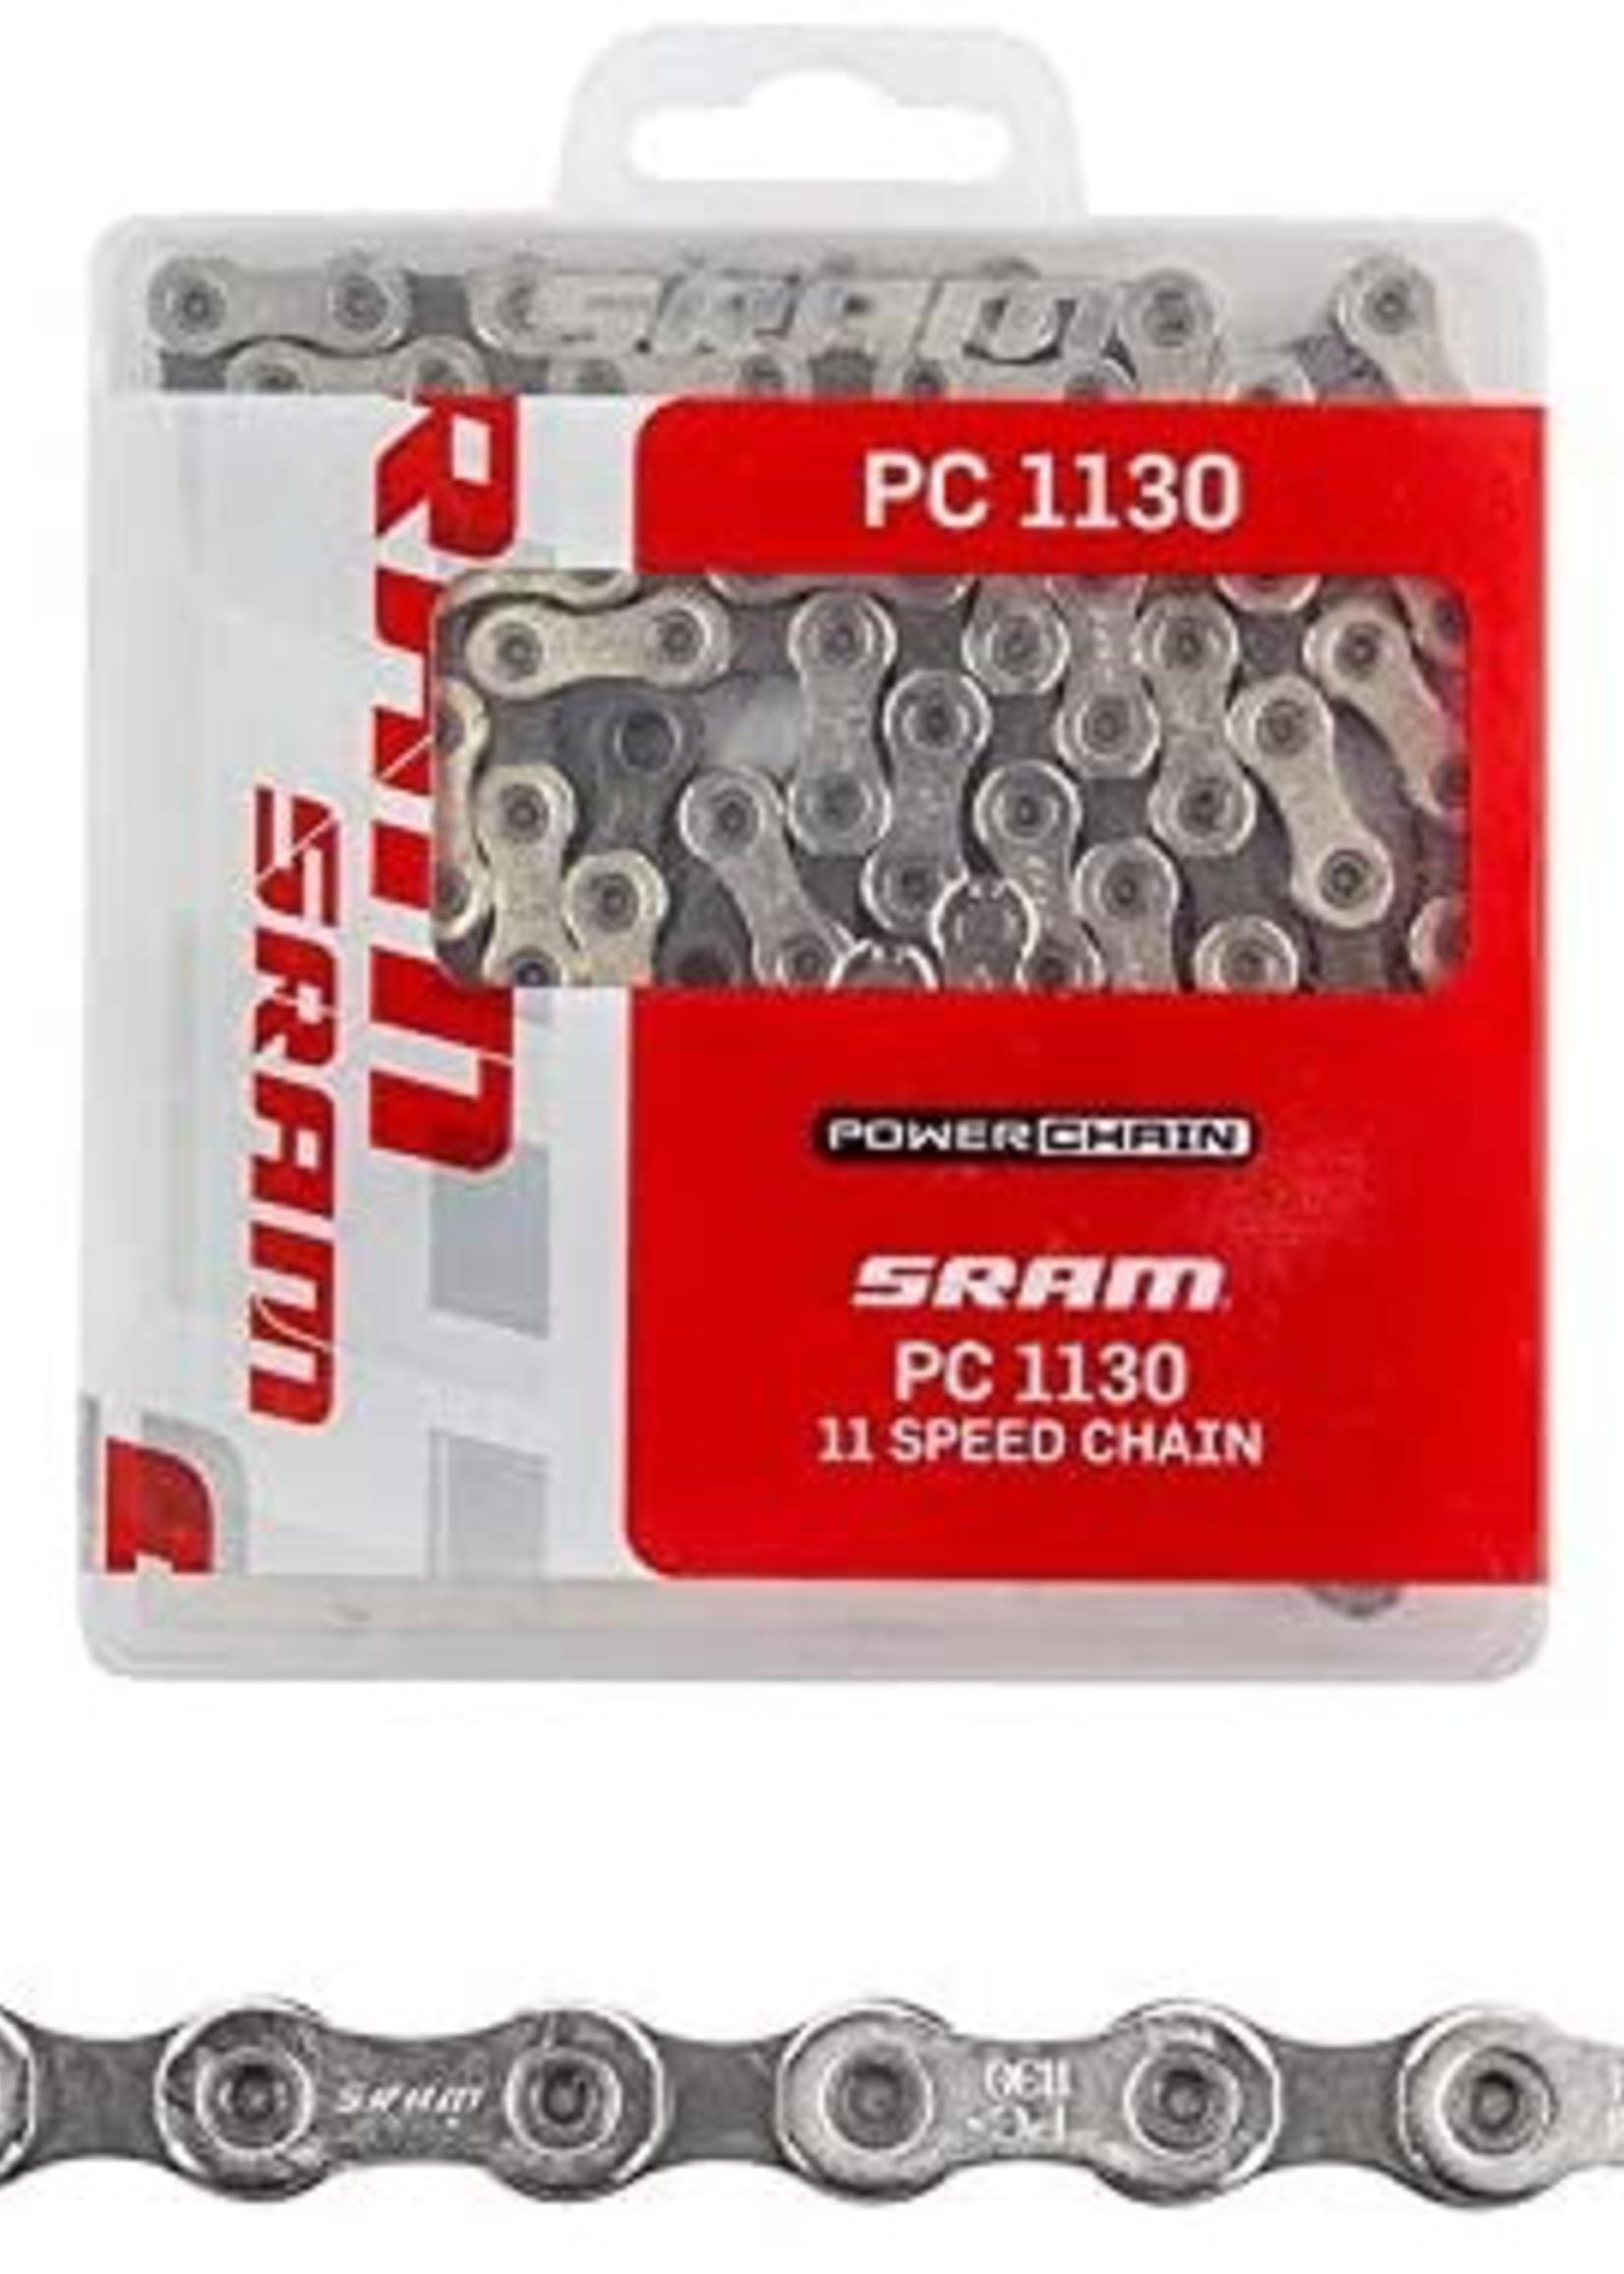 SRAM SRAM PC1130 11 SPEED CHAIN